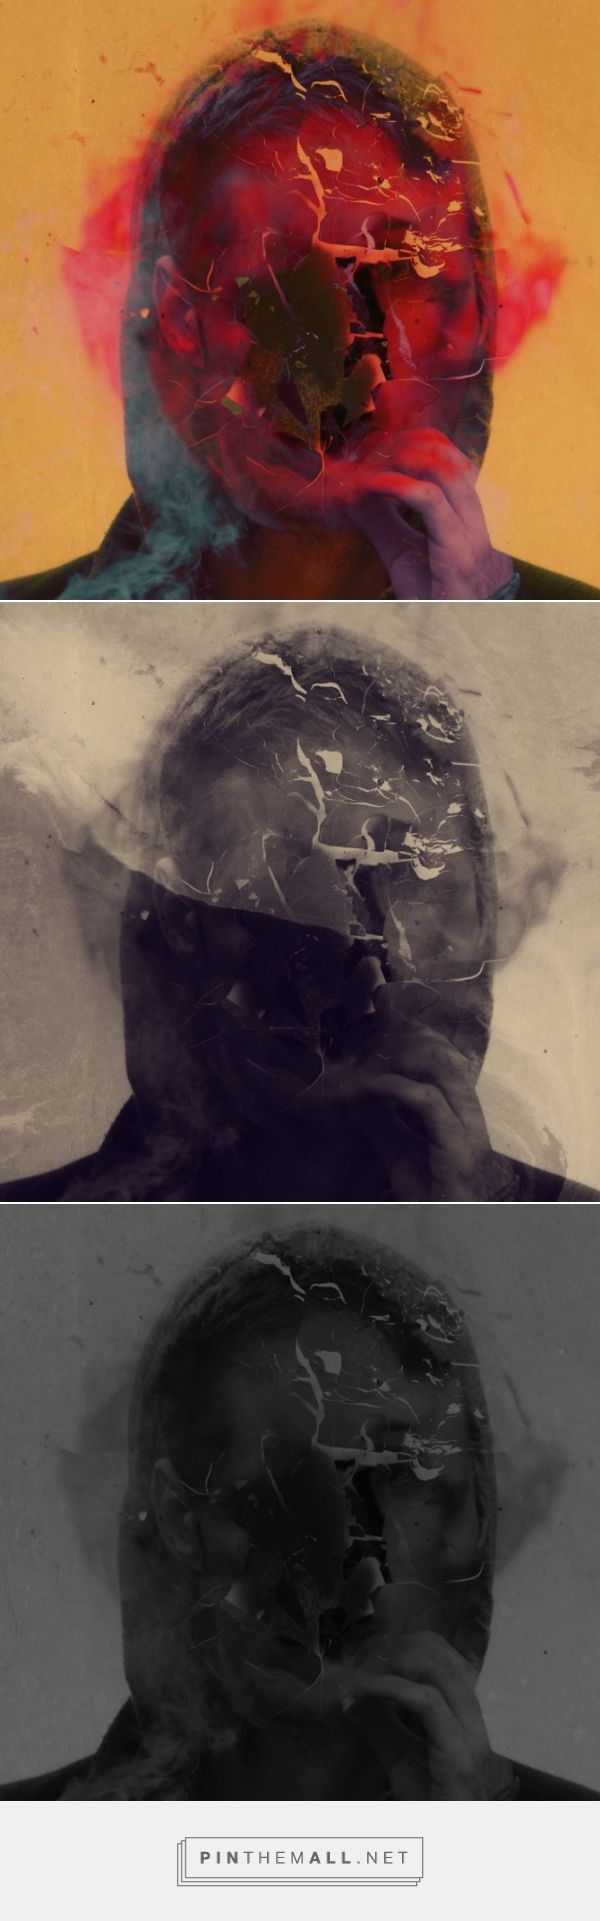 Coldair music - Matt Vial